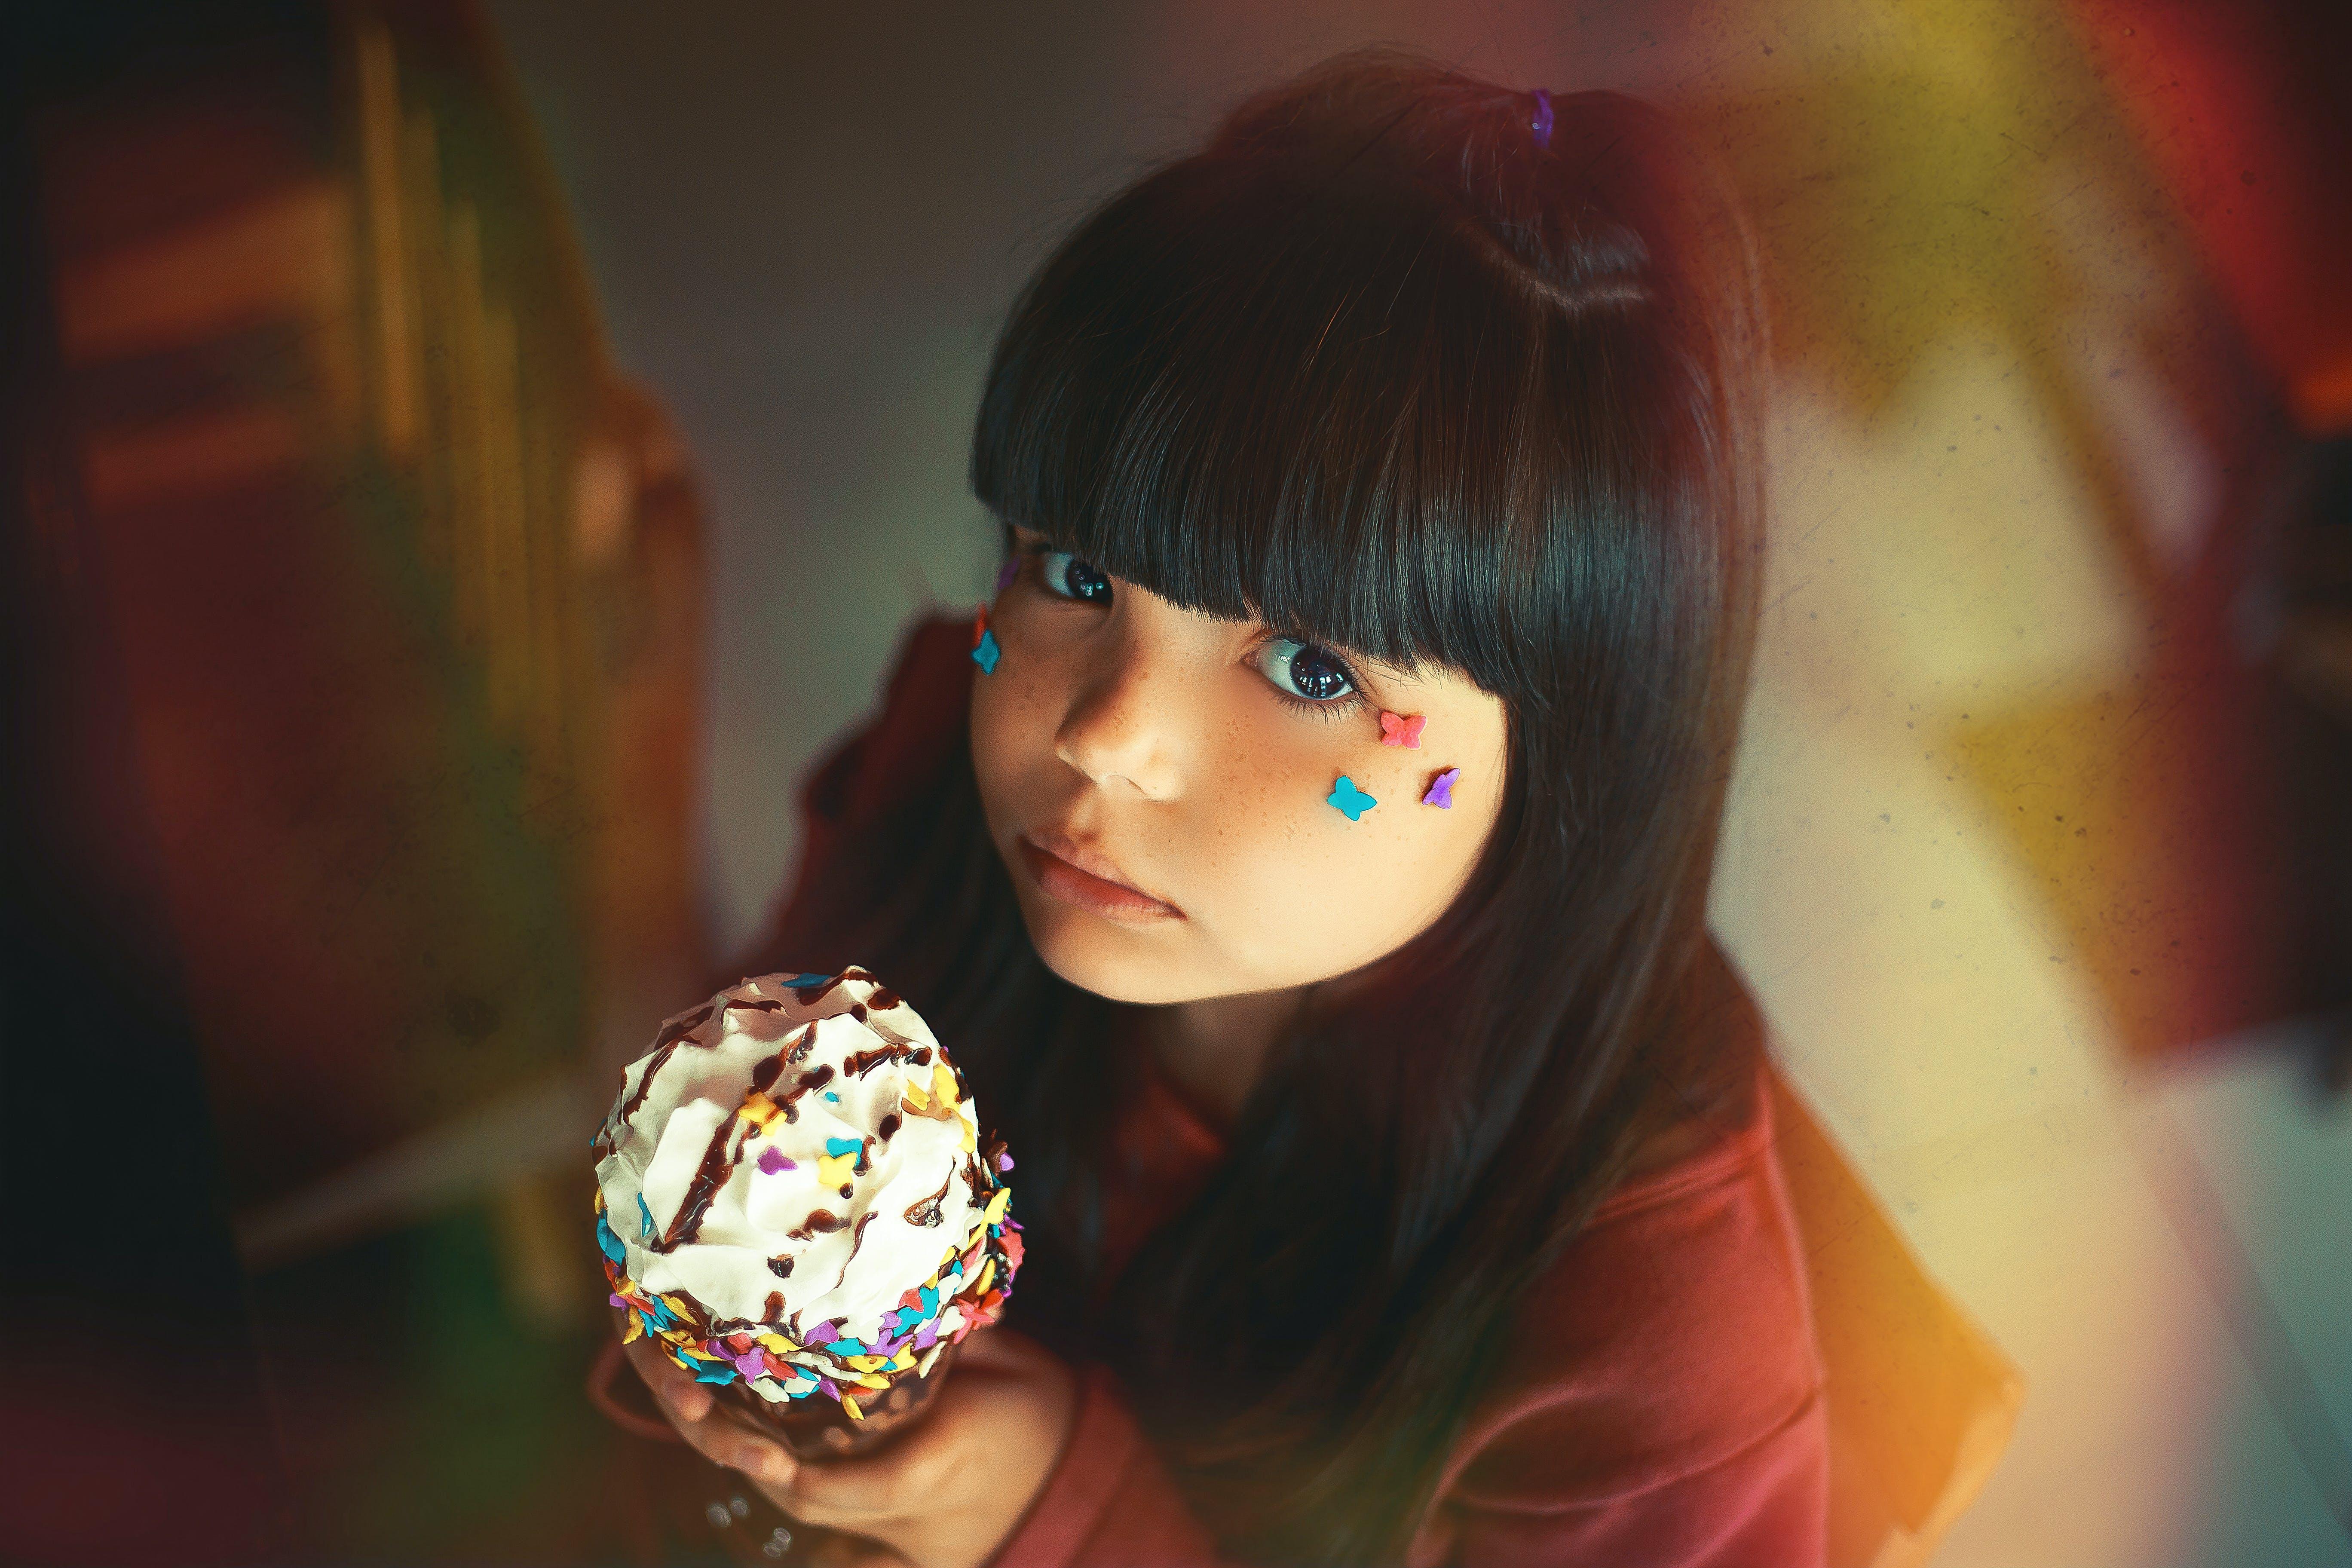 Girl Holding Ice Cream